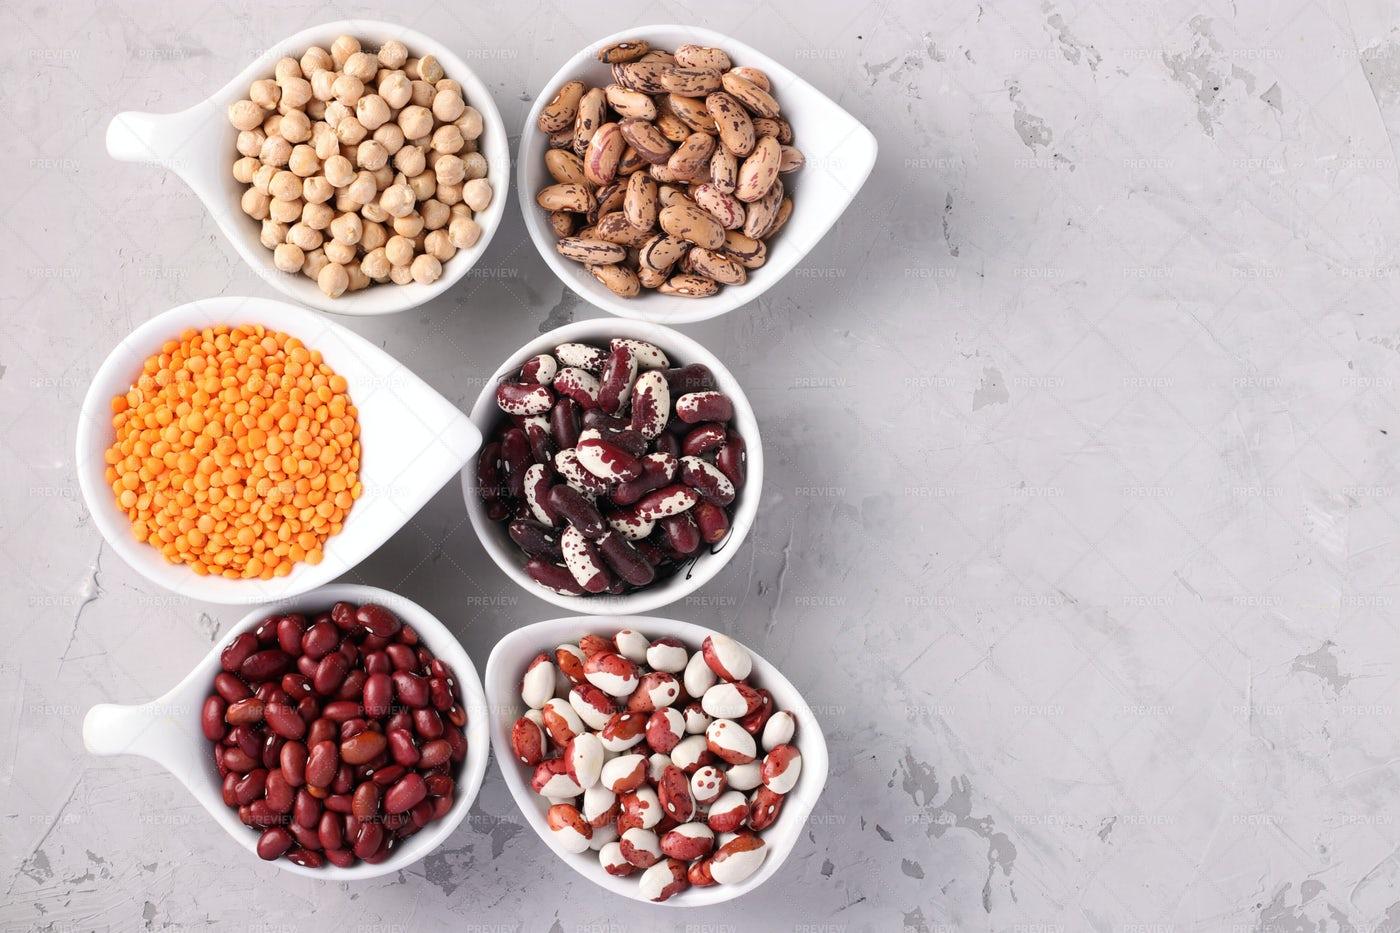 Varieties Of Beans: Stock Photos